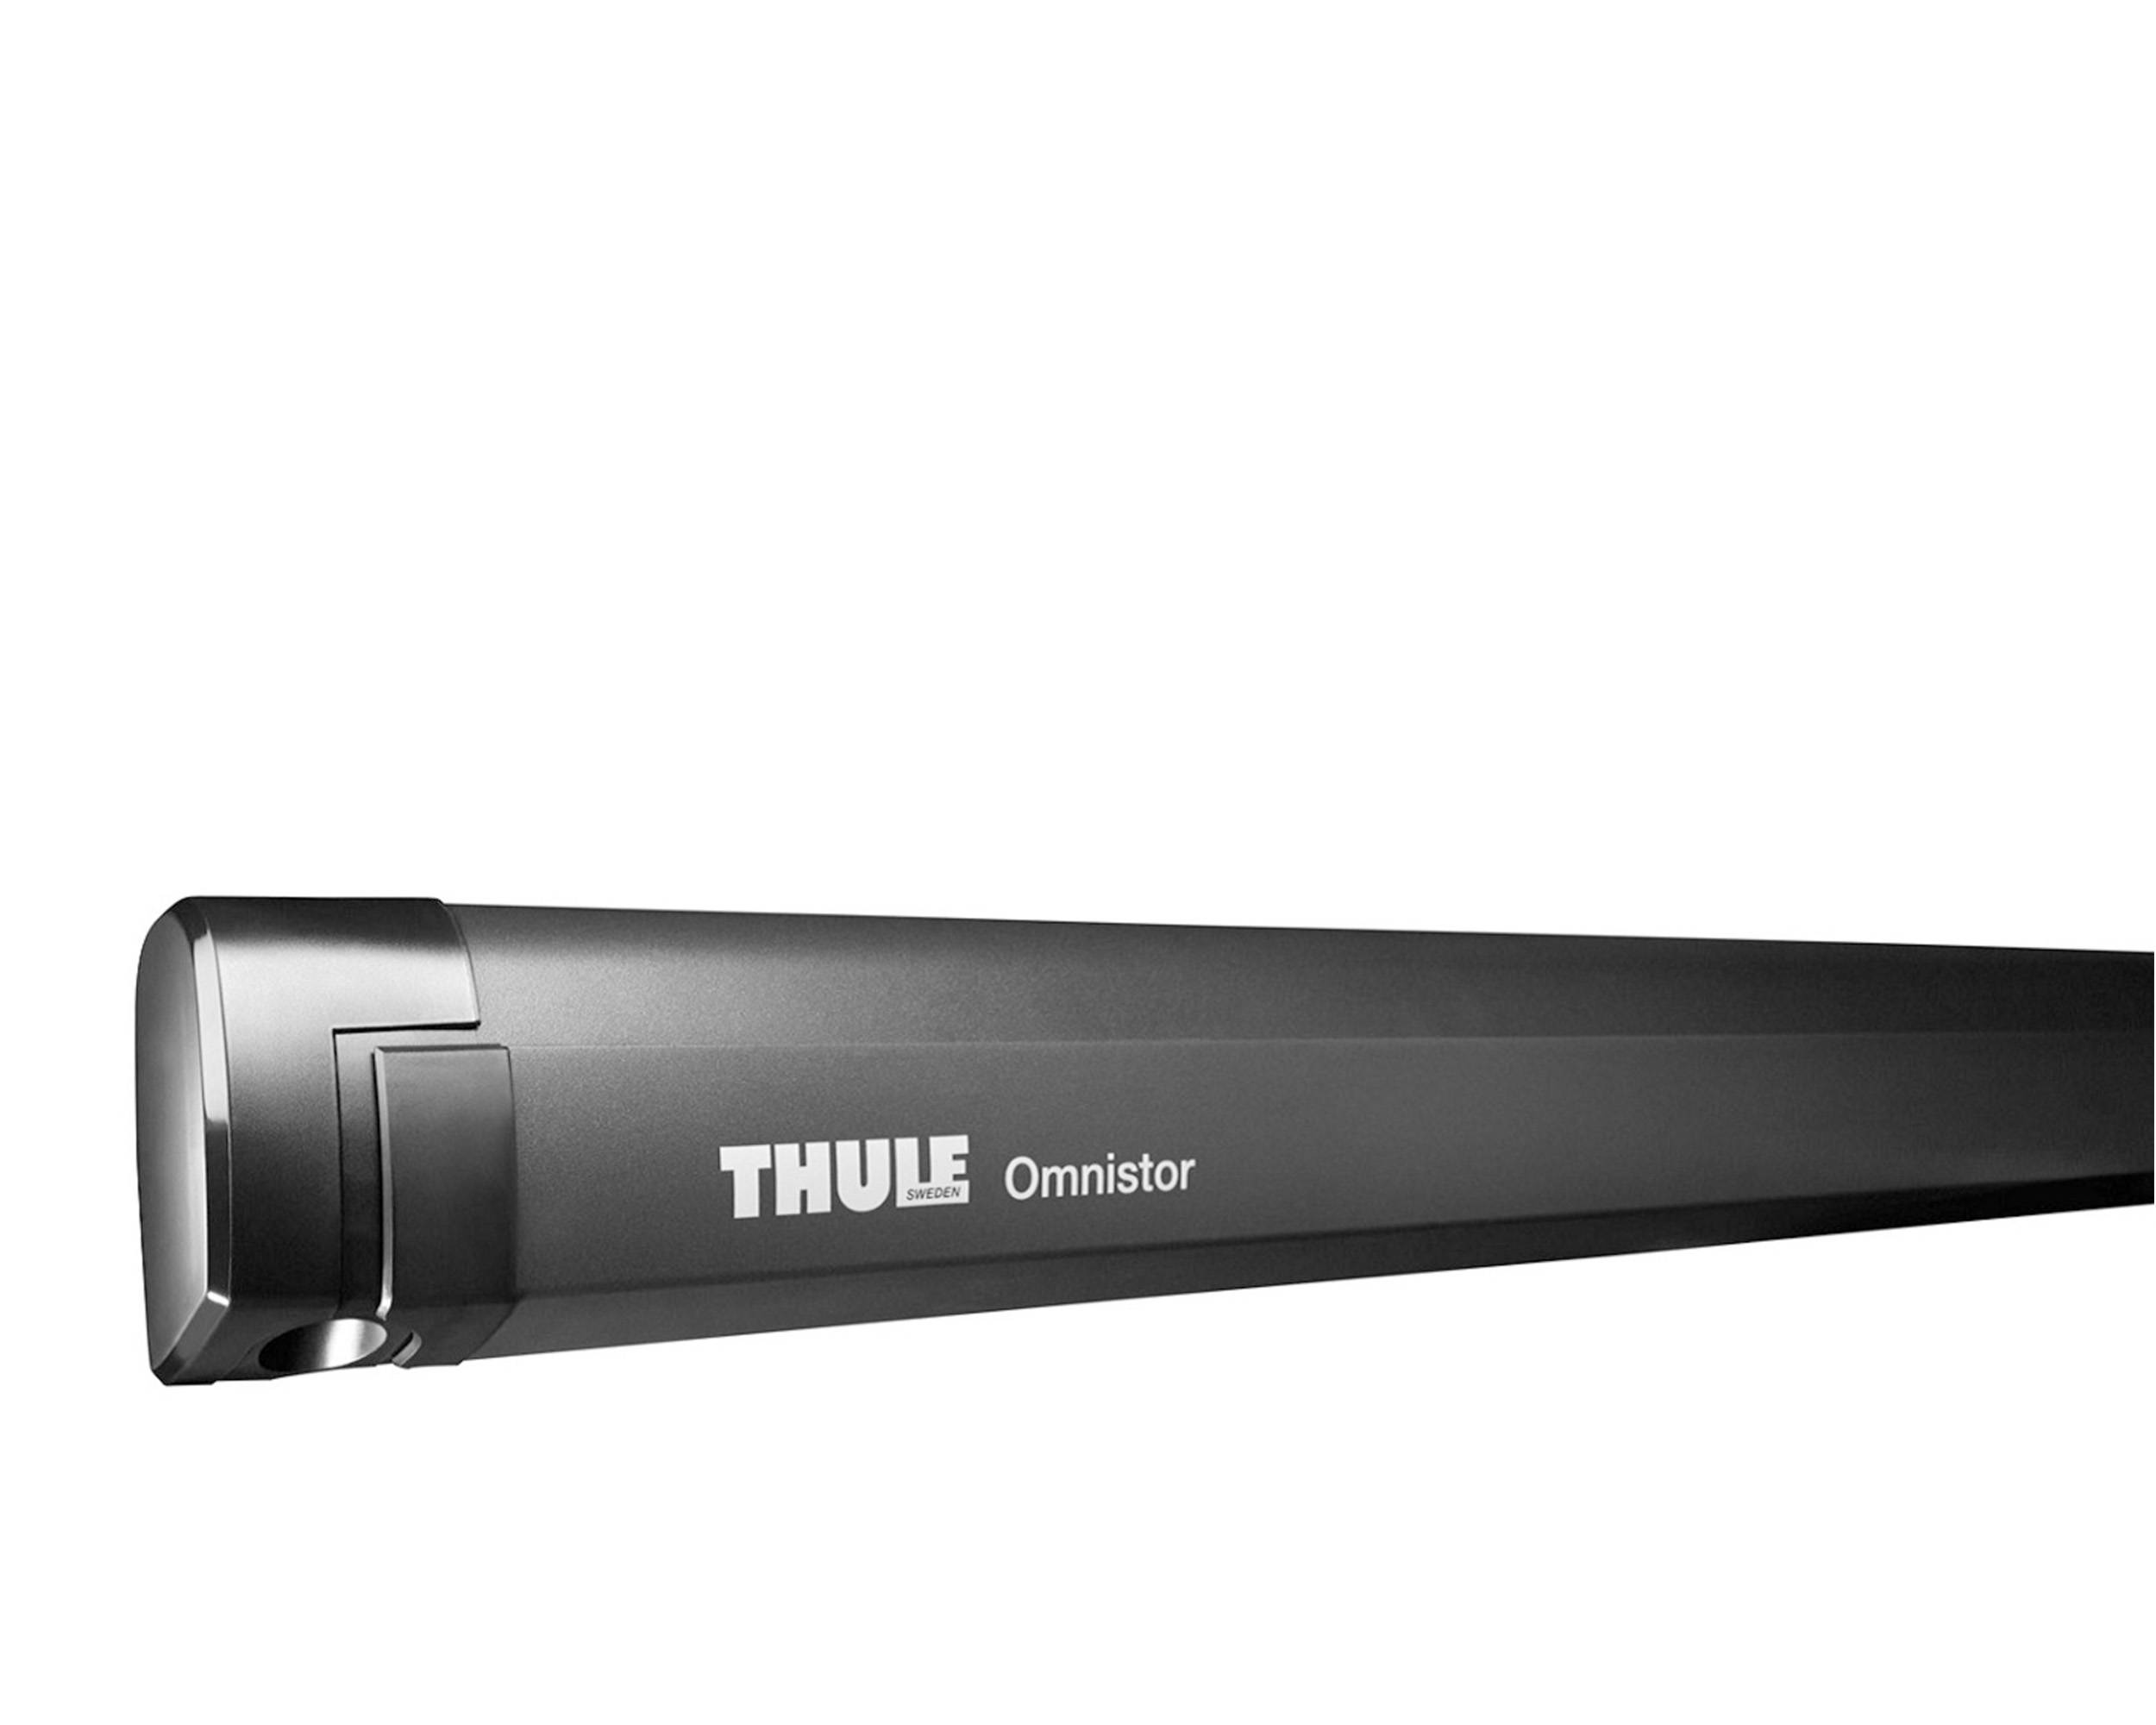 Thule omnistor 5200 antraciet cannenburg